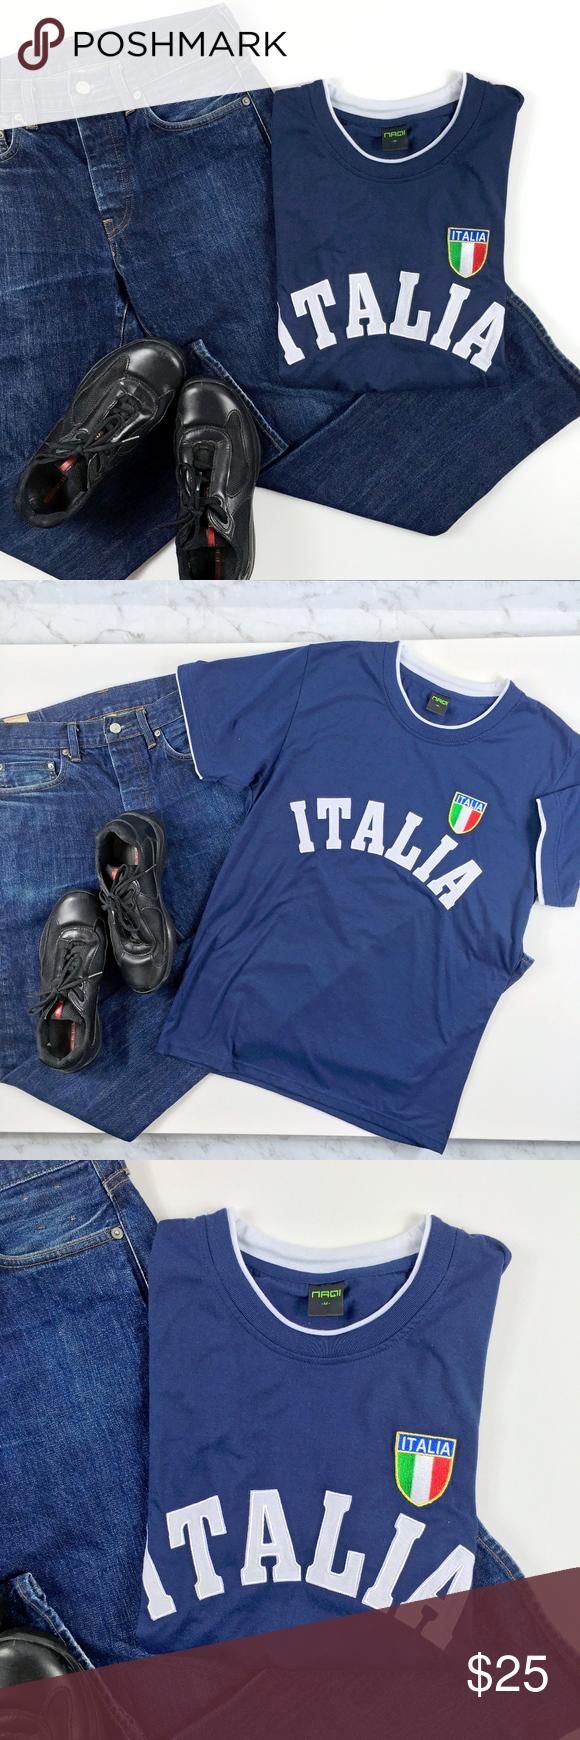 21032693870 Mens ITALIA Italian Fitted T Shirt Mens